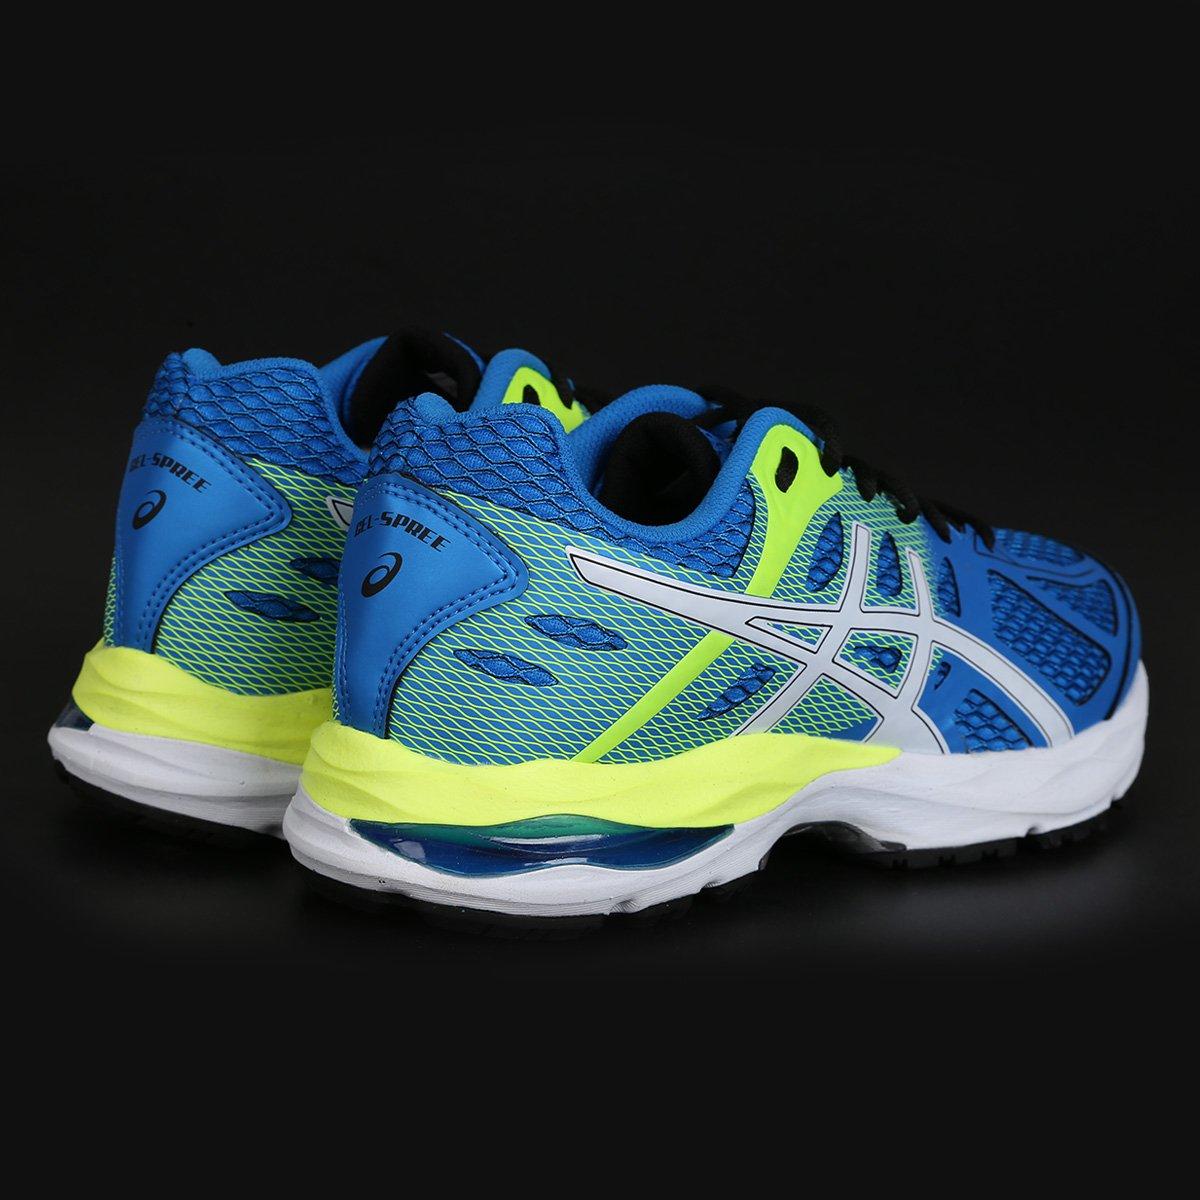 Tênis Asics Gel Spree Masculino - Azul e Branco - Compre Agora  cf4d04a797bf6